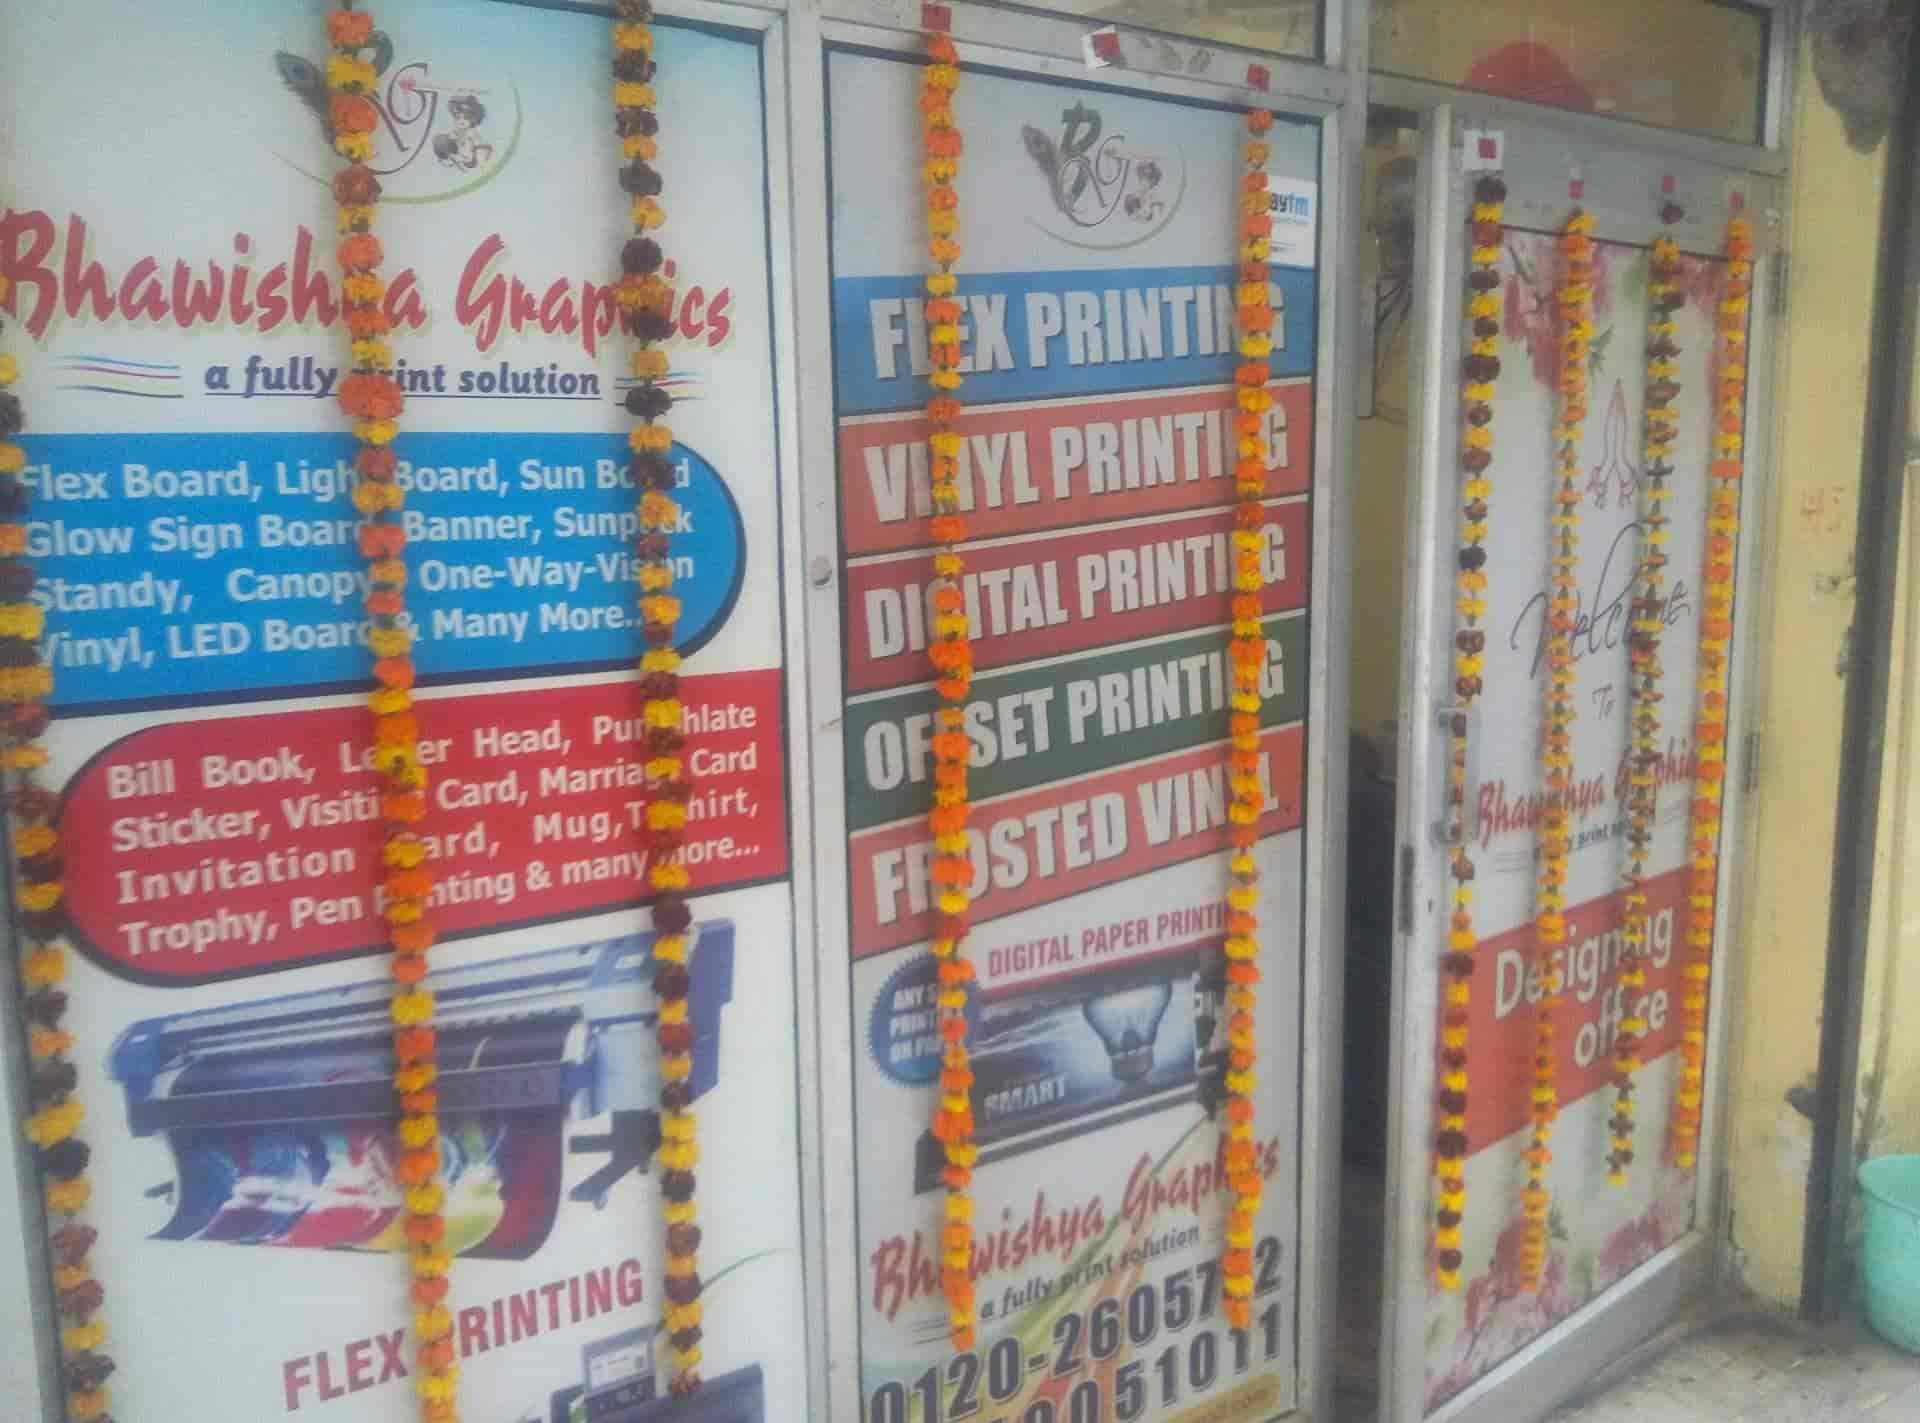 Bhawishya Graphics, Indirapuram - Flex Printing Services in